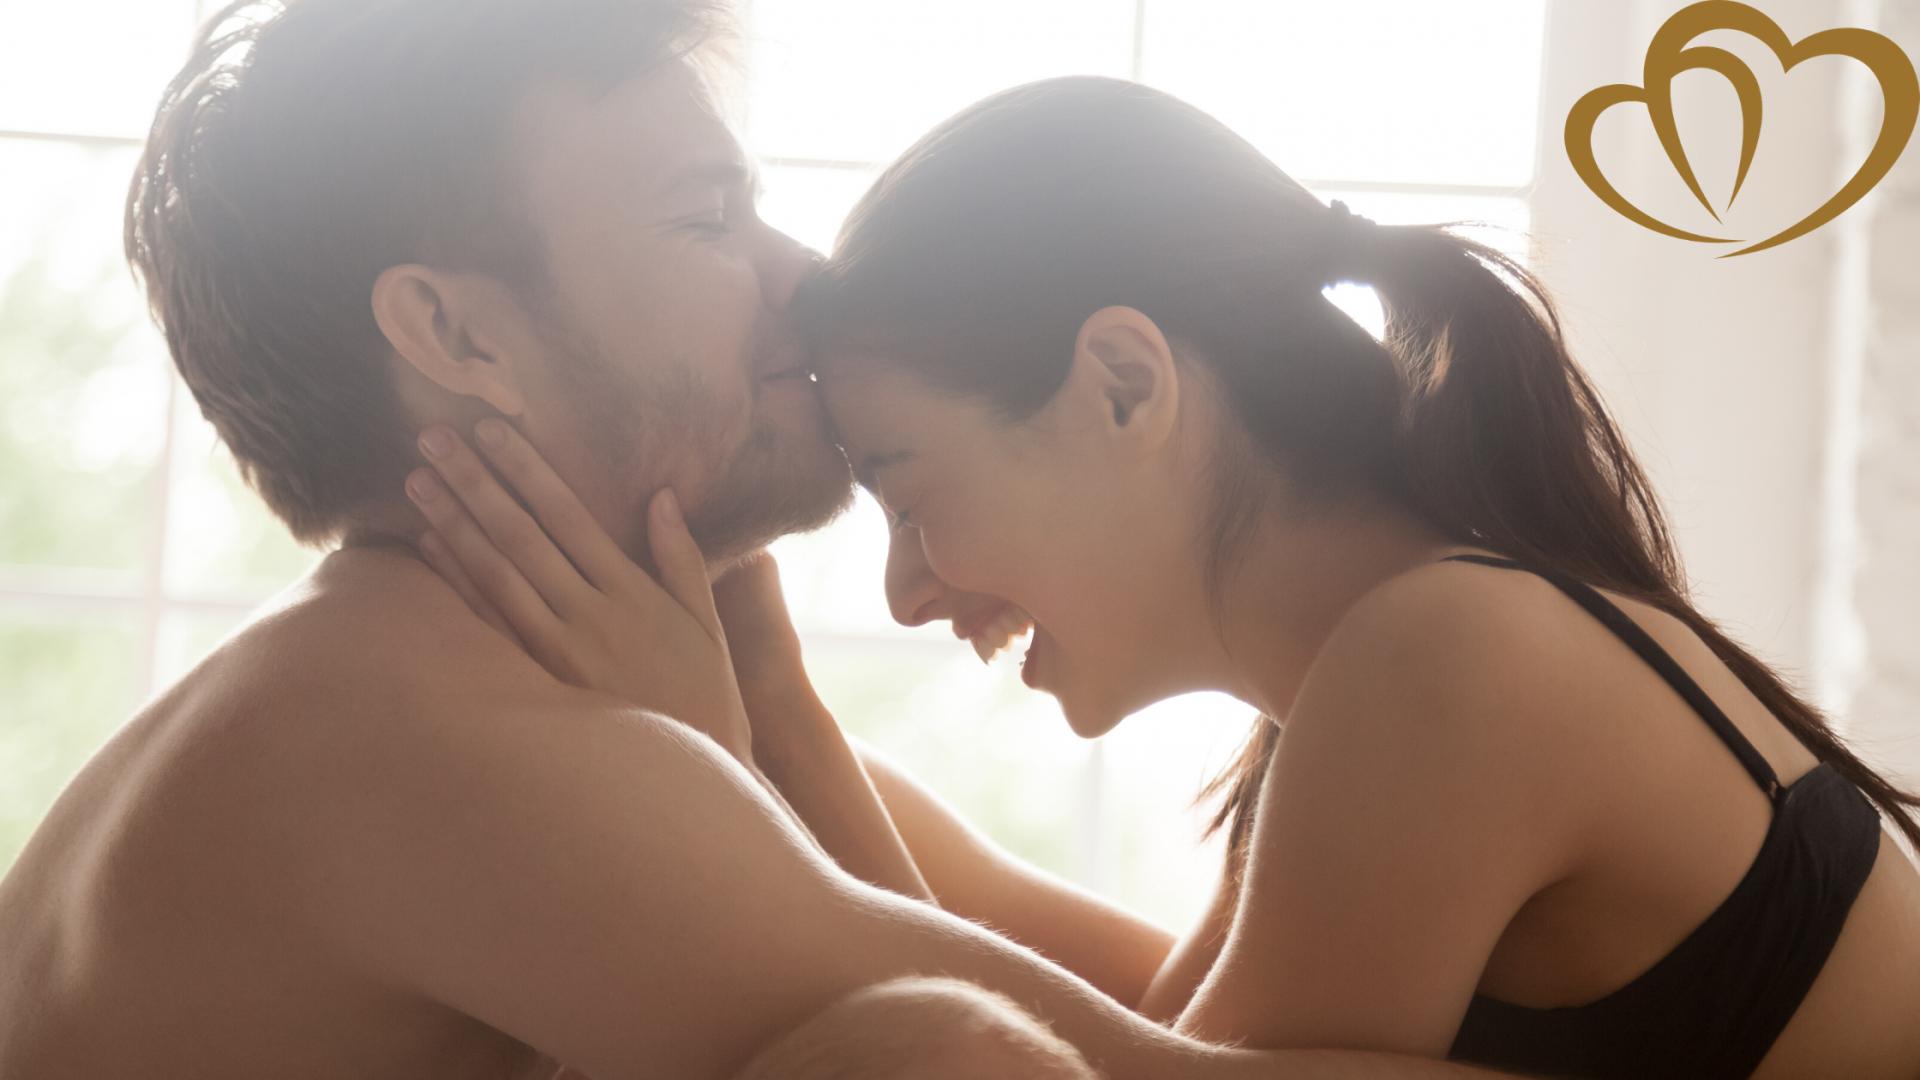 Naked Hot Kissing Romantic Kiss